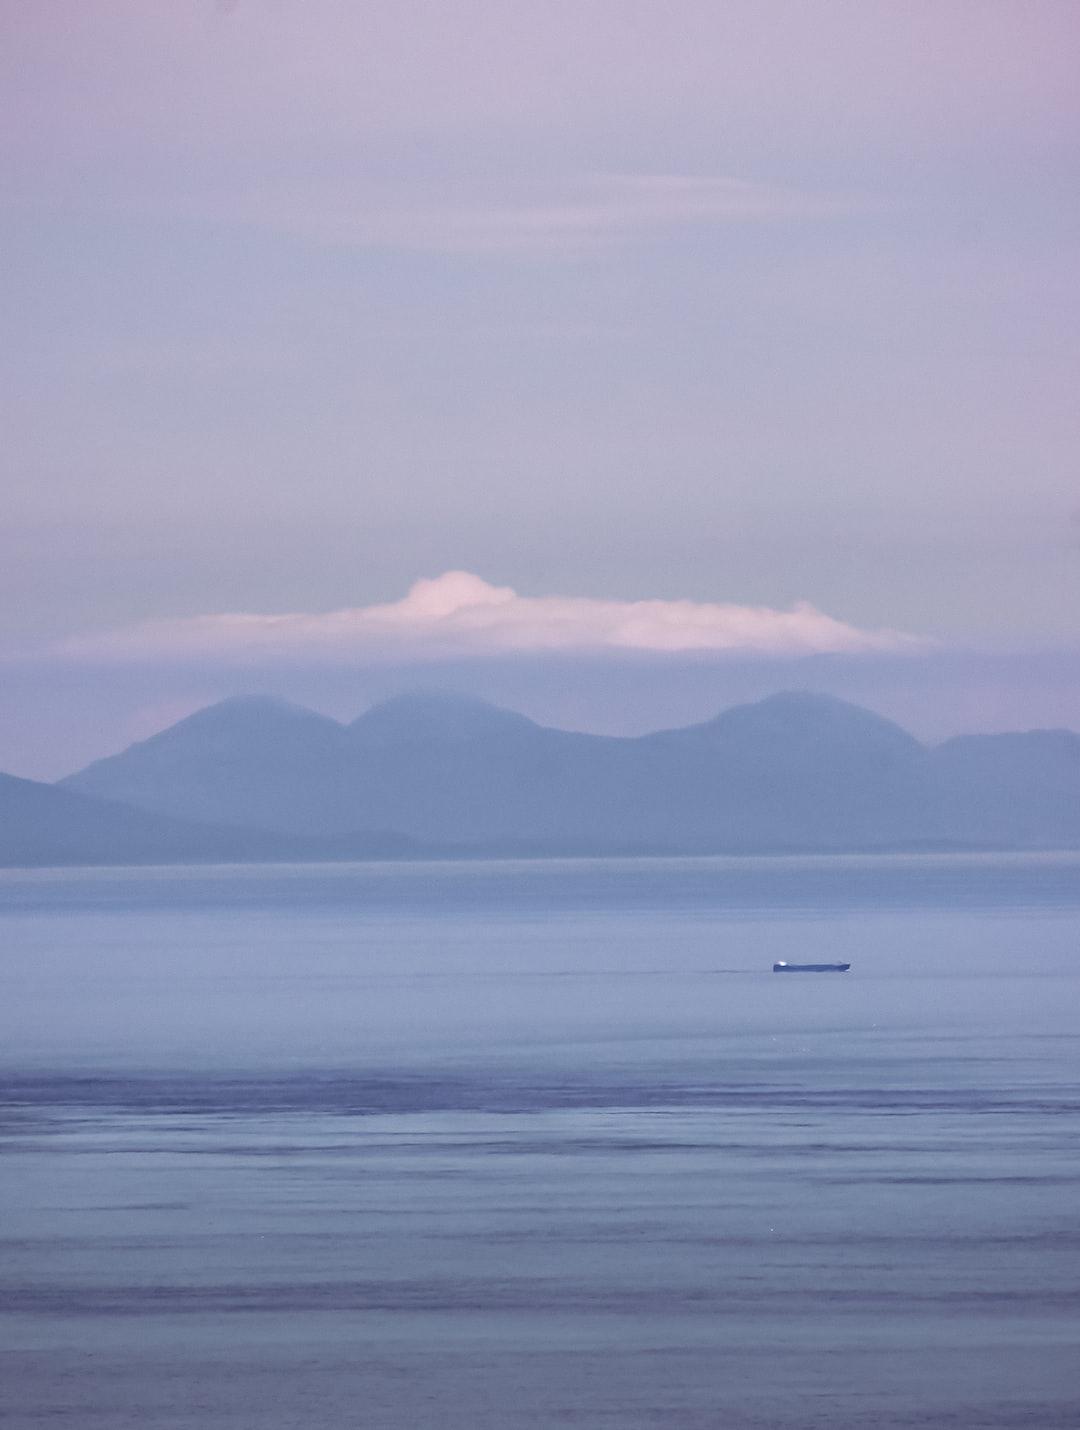 A tanker sails toward the Irish Sea past the coastline of the Scottish Highlands (shot from Fair Head, Jun., 2020).